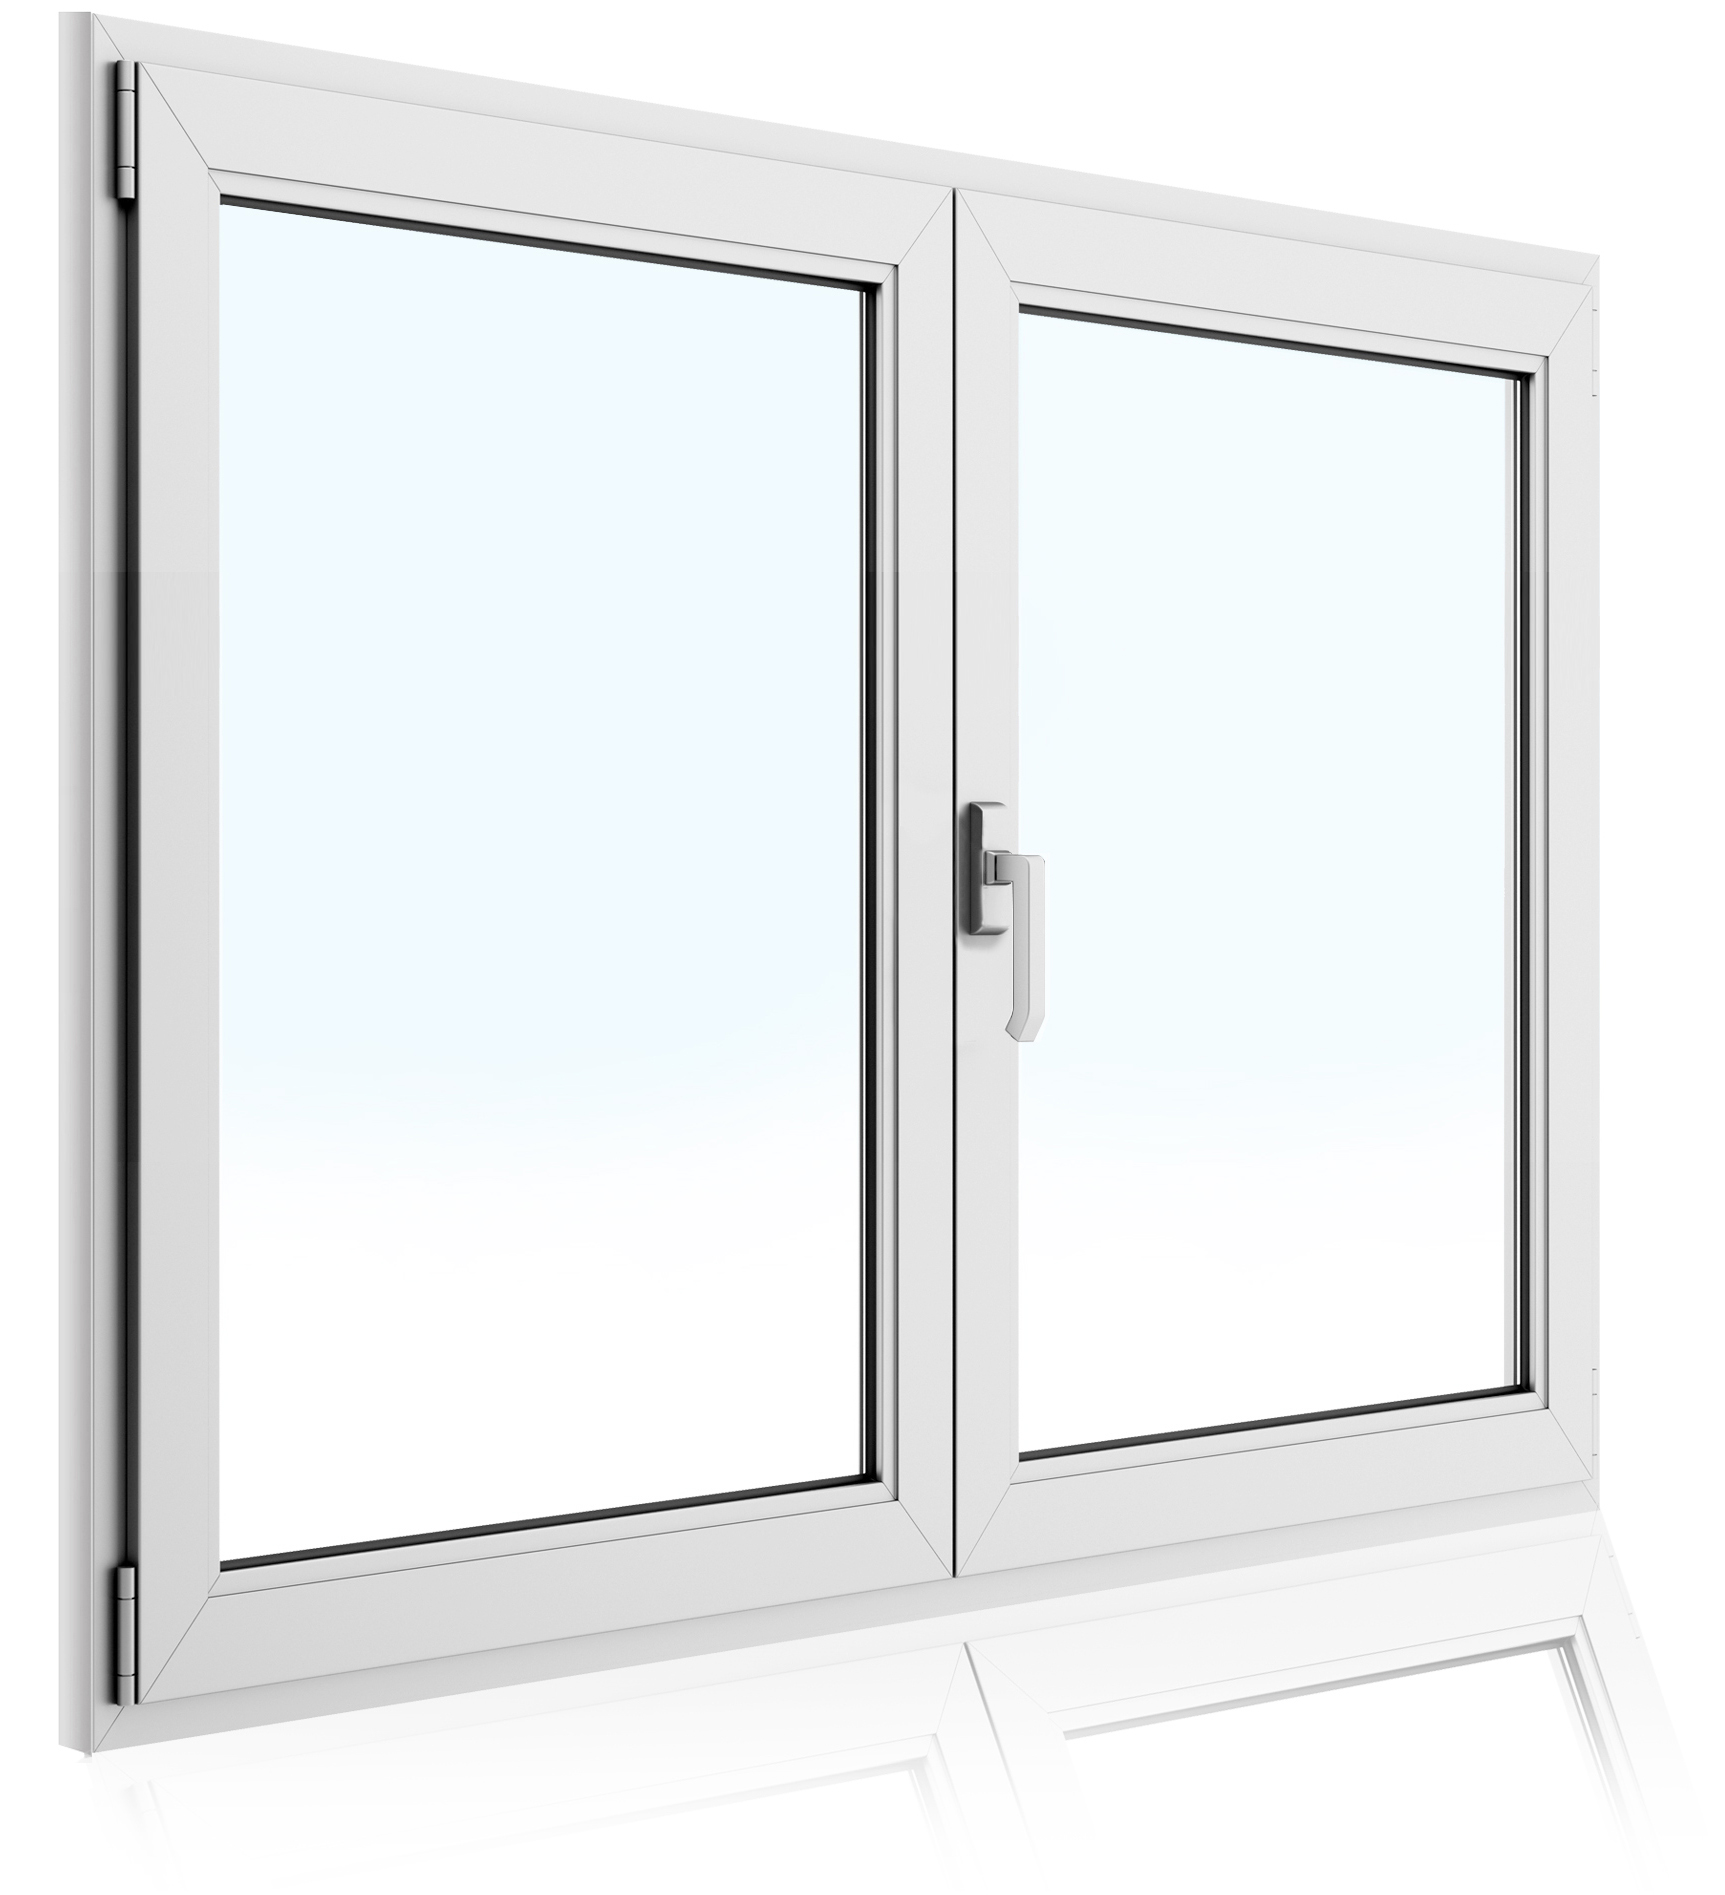 kunstofffenster fenster pvc 180 cm breite alle h he dreh kipp 2 fl gel top ebay. Black Bedroom Furniture Sets. Home Design Ideas